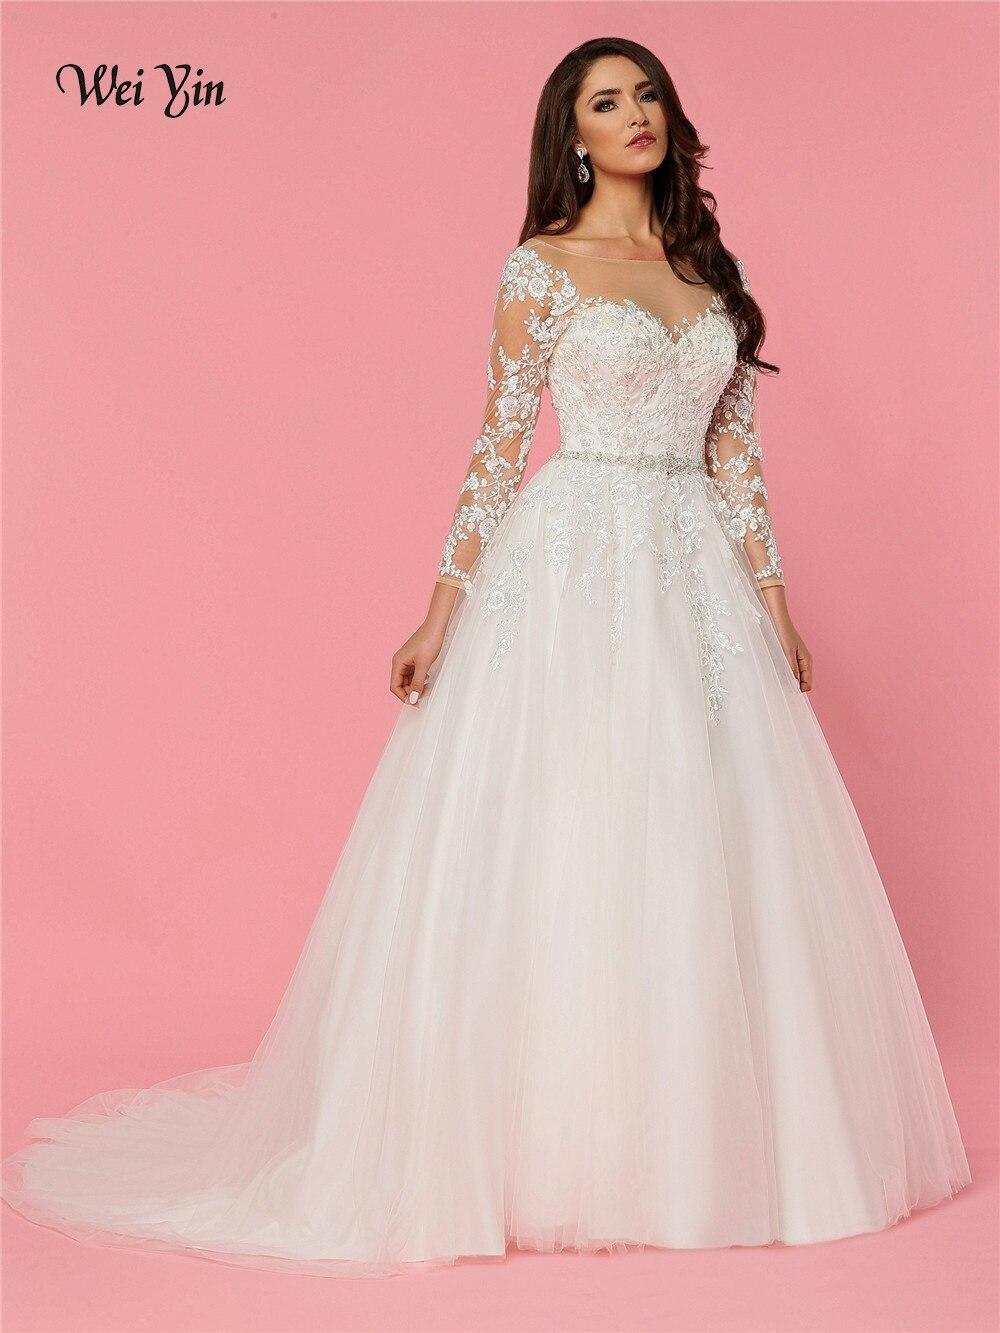 weiyin2018 New White/Ivory Short Wedding Dresses The Brides Sexy ...